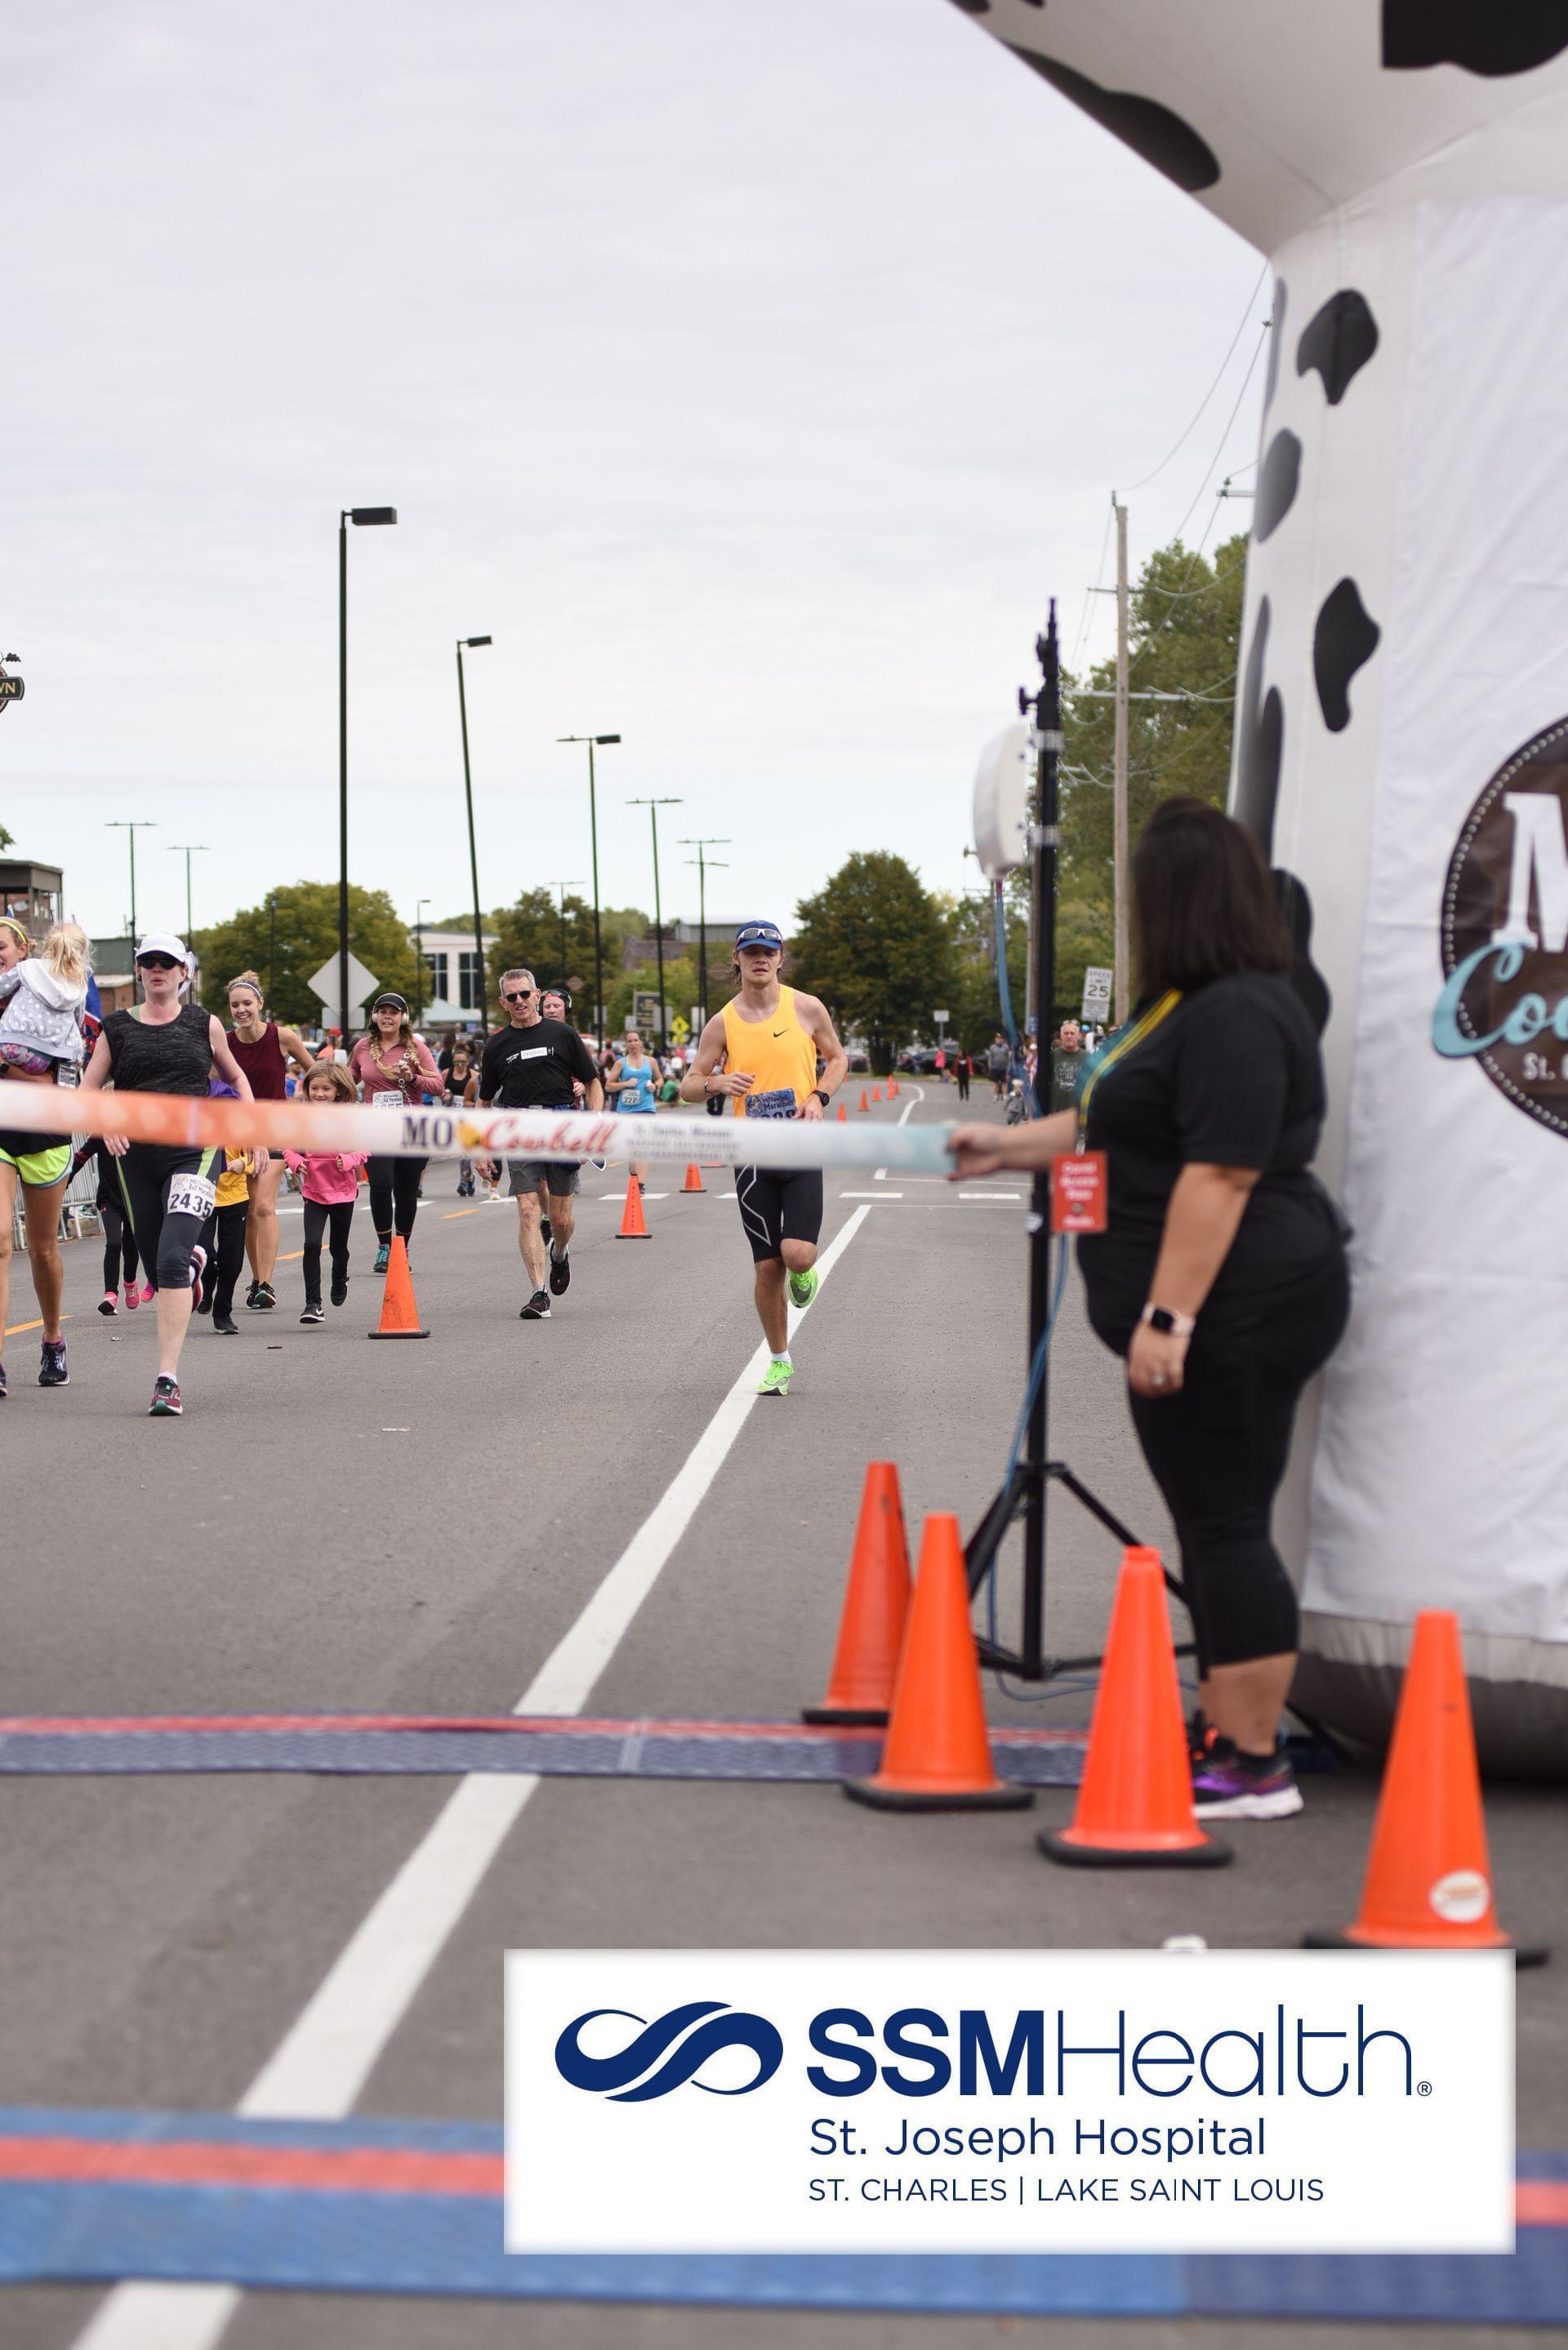 Brenner Webster Wins 1st Ever Marathon He Runs, Now Qualifies For Boston 2021